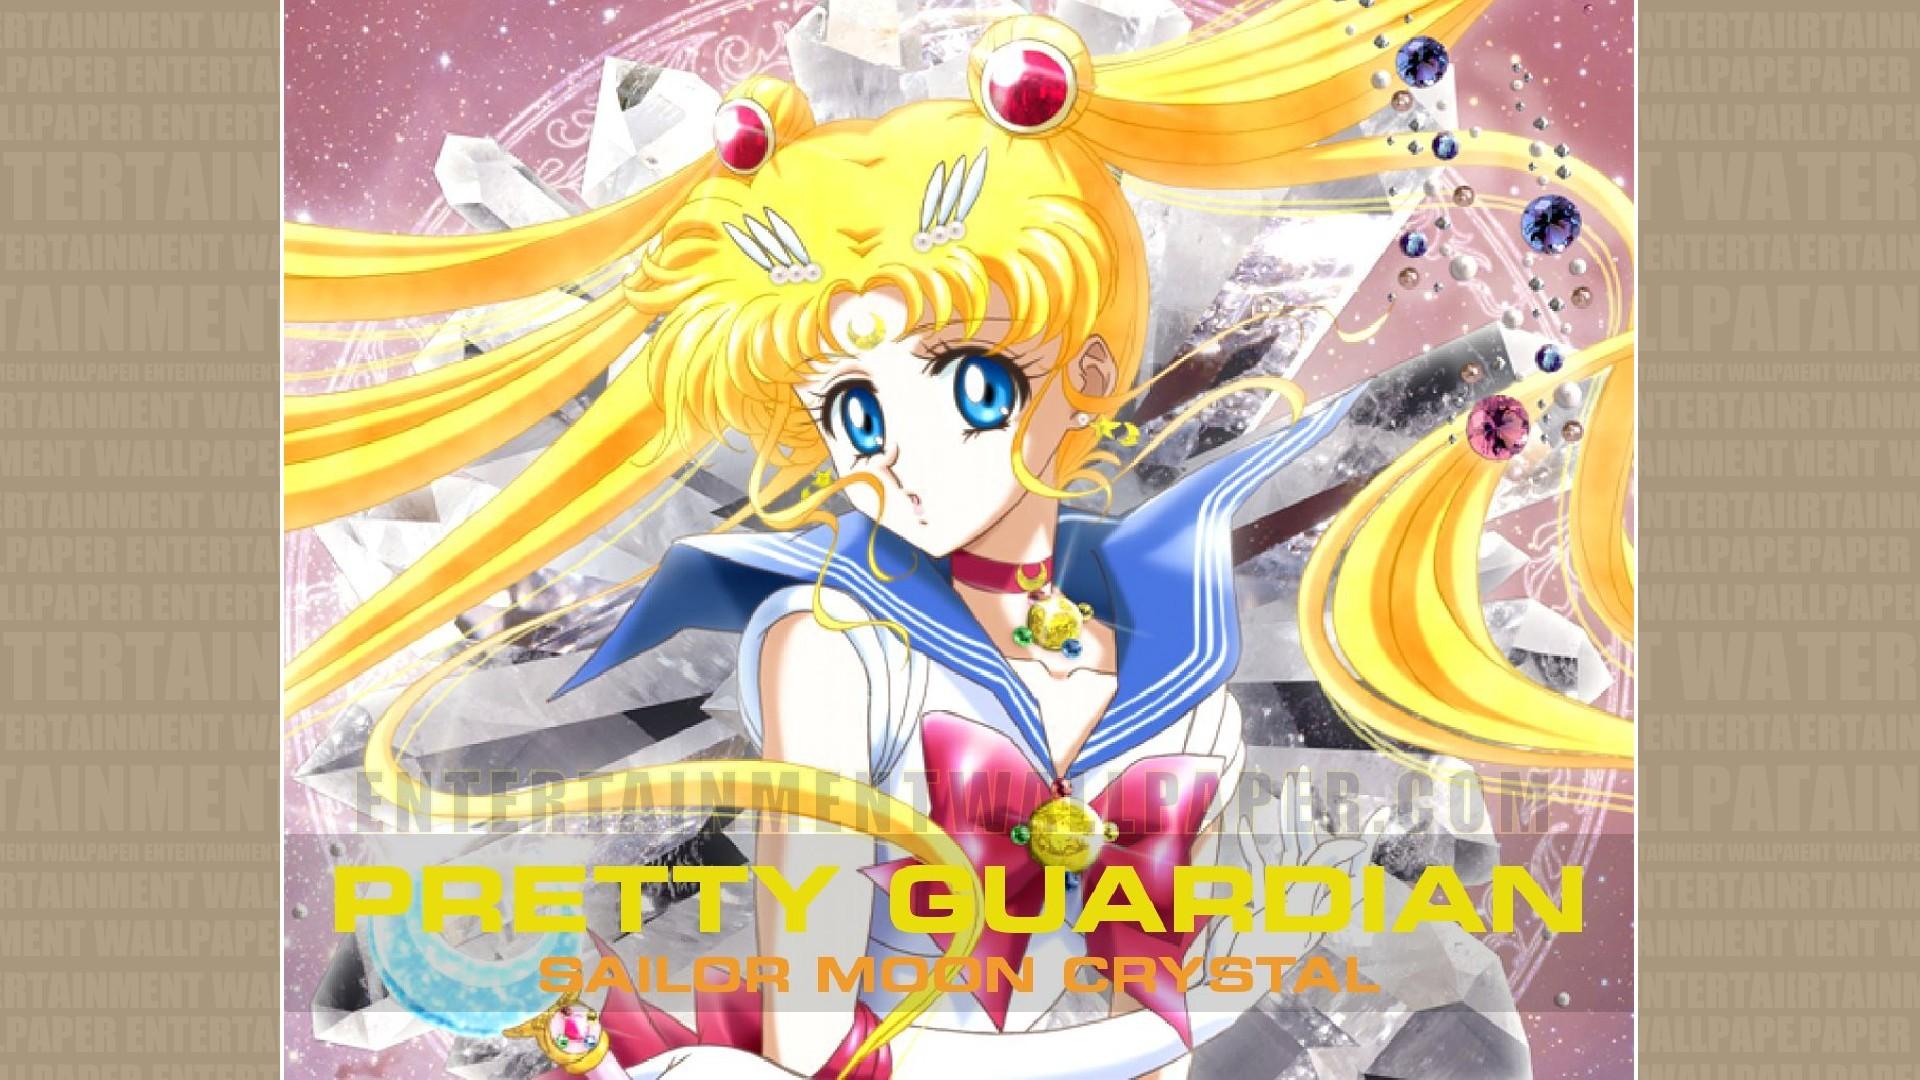 Pretty Guardian Sailor Moon Crystal Wallpaper – Original size, download now.